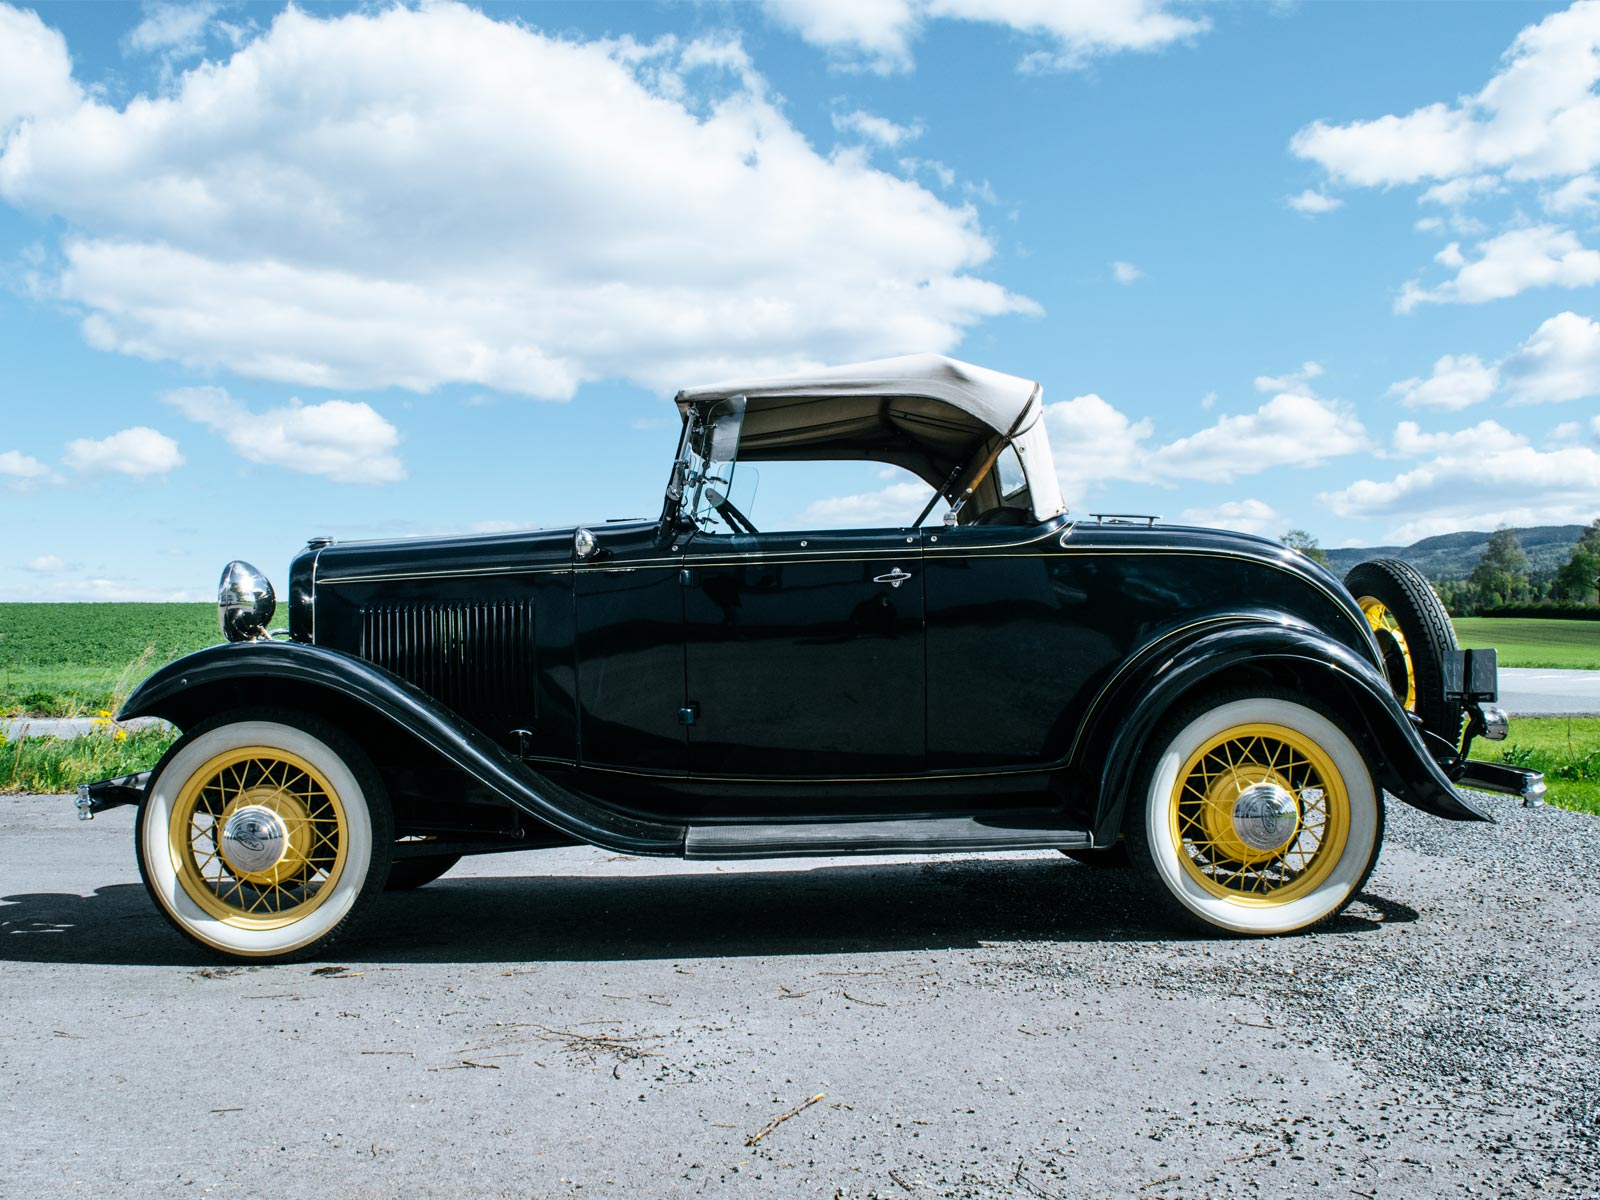 Ford B Roadster 1932 modell.